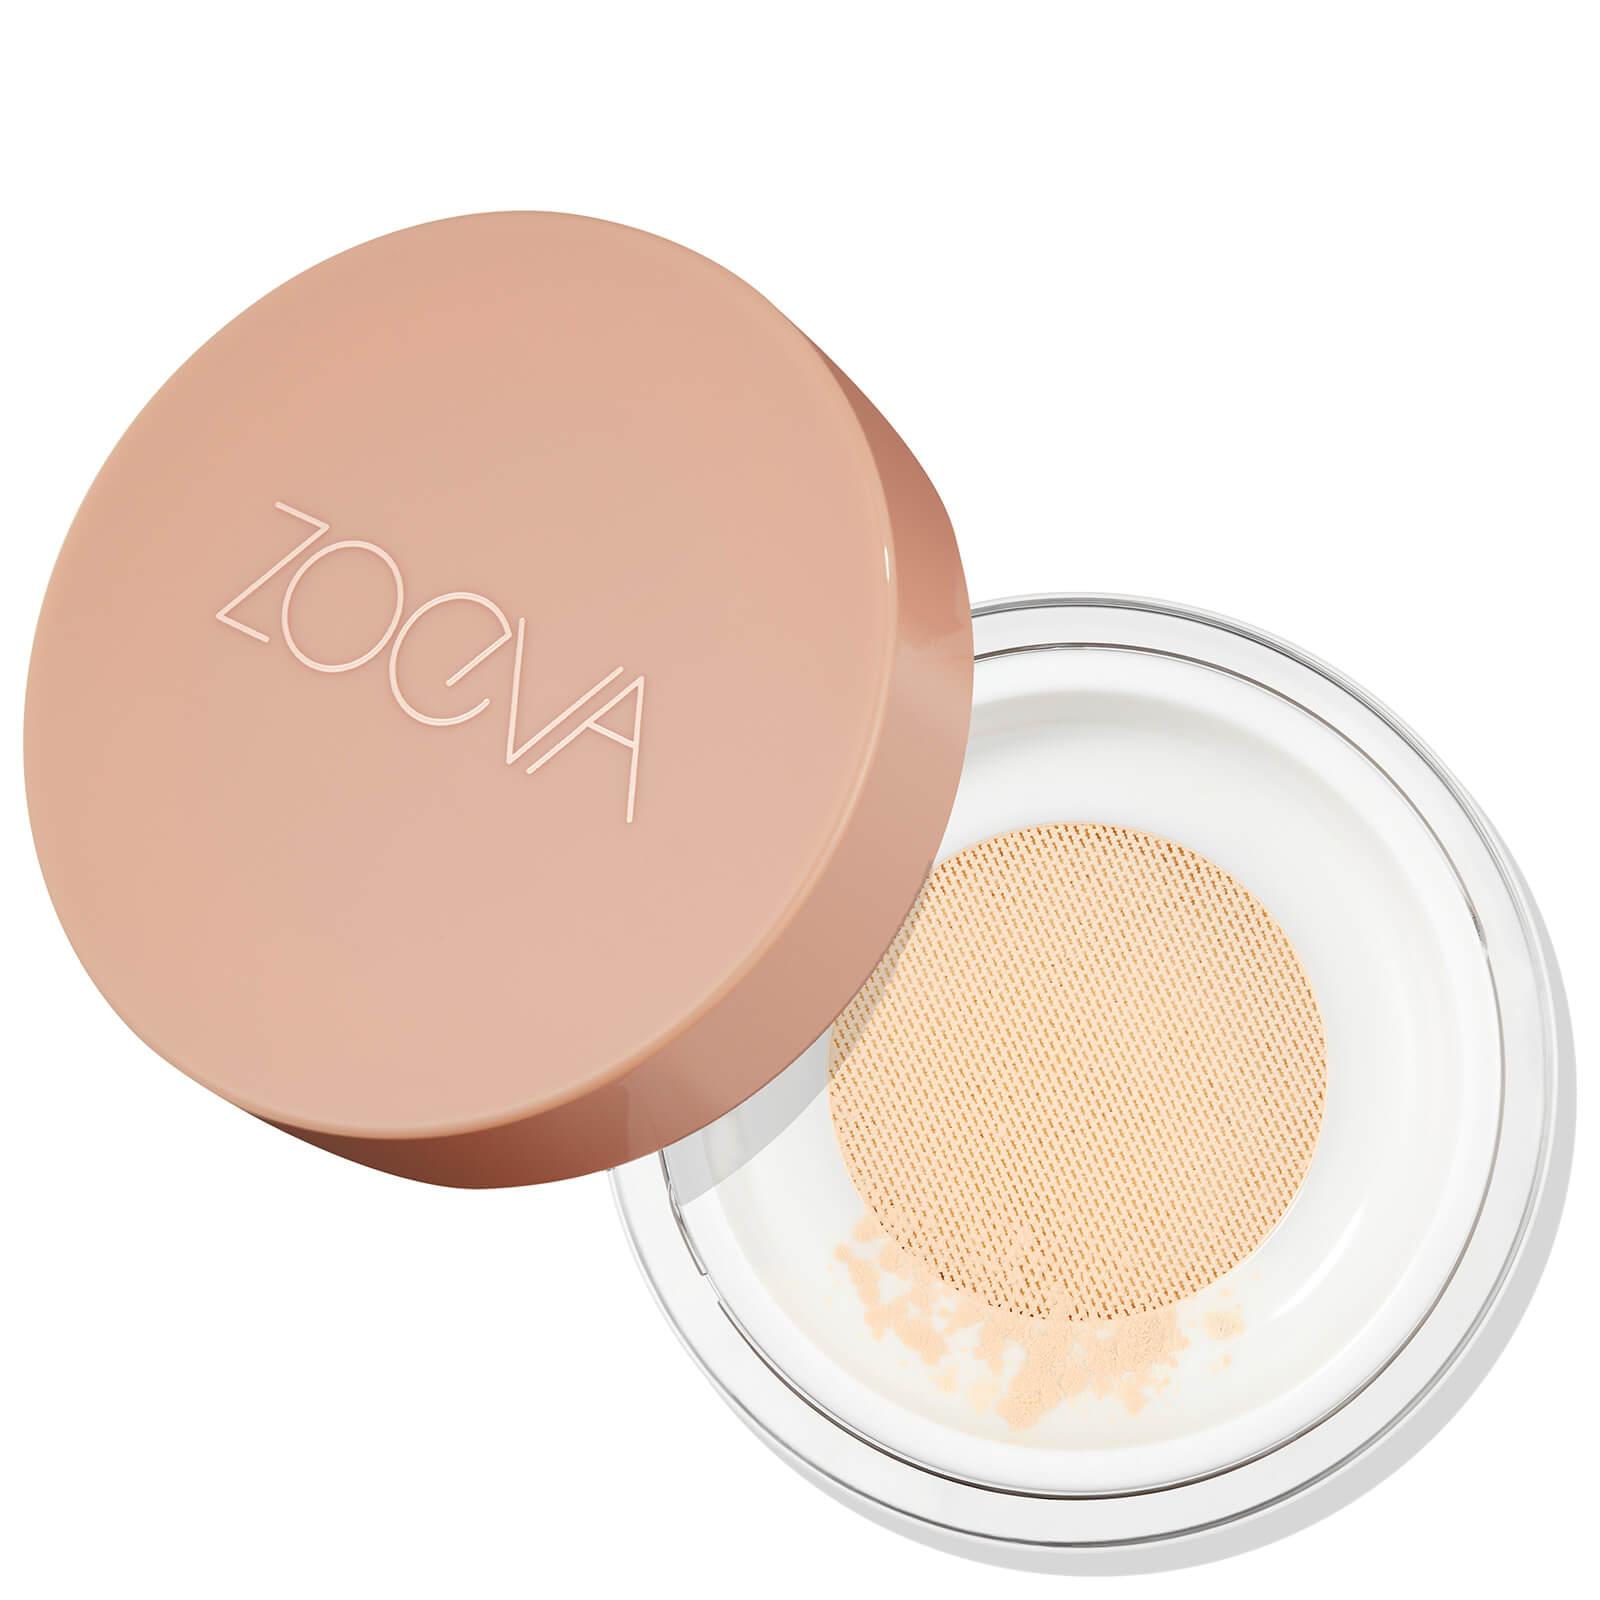 Купить ZOEVA Authentik Skin Finishing Powder 14g (Various Shades) - Outstanding